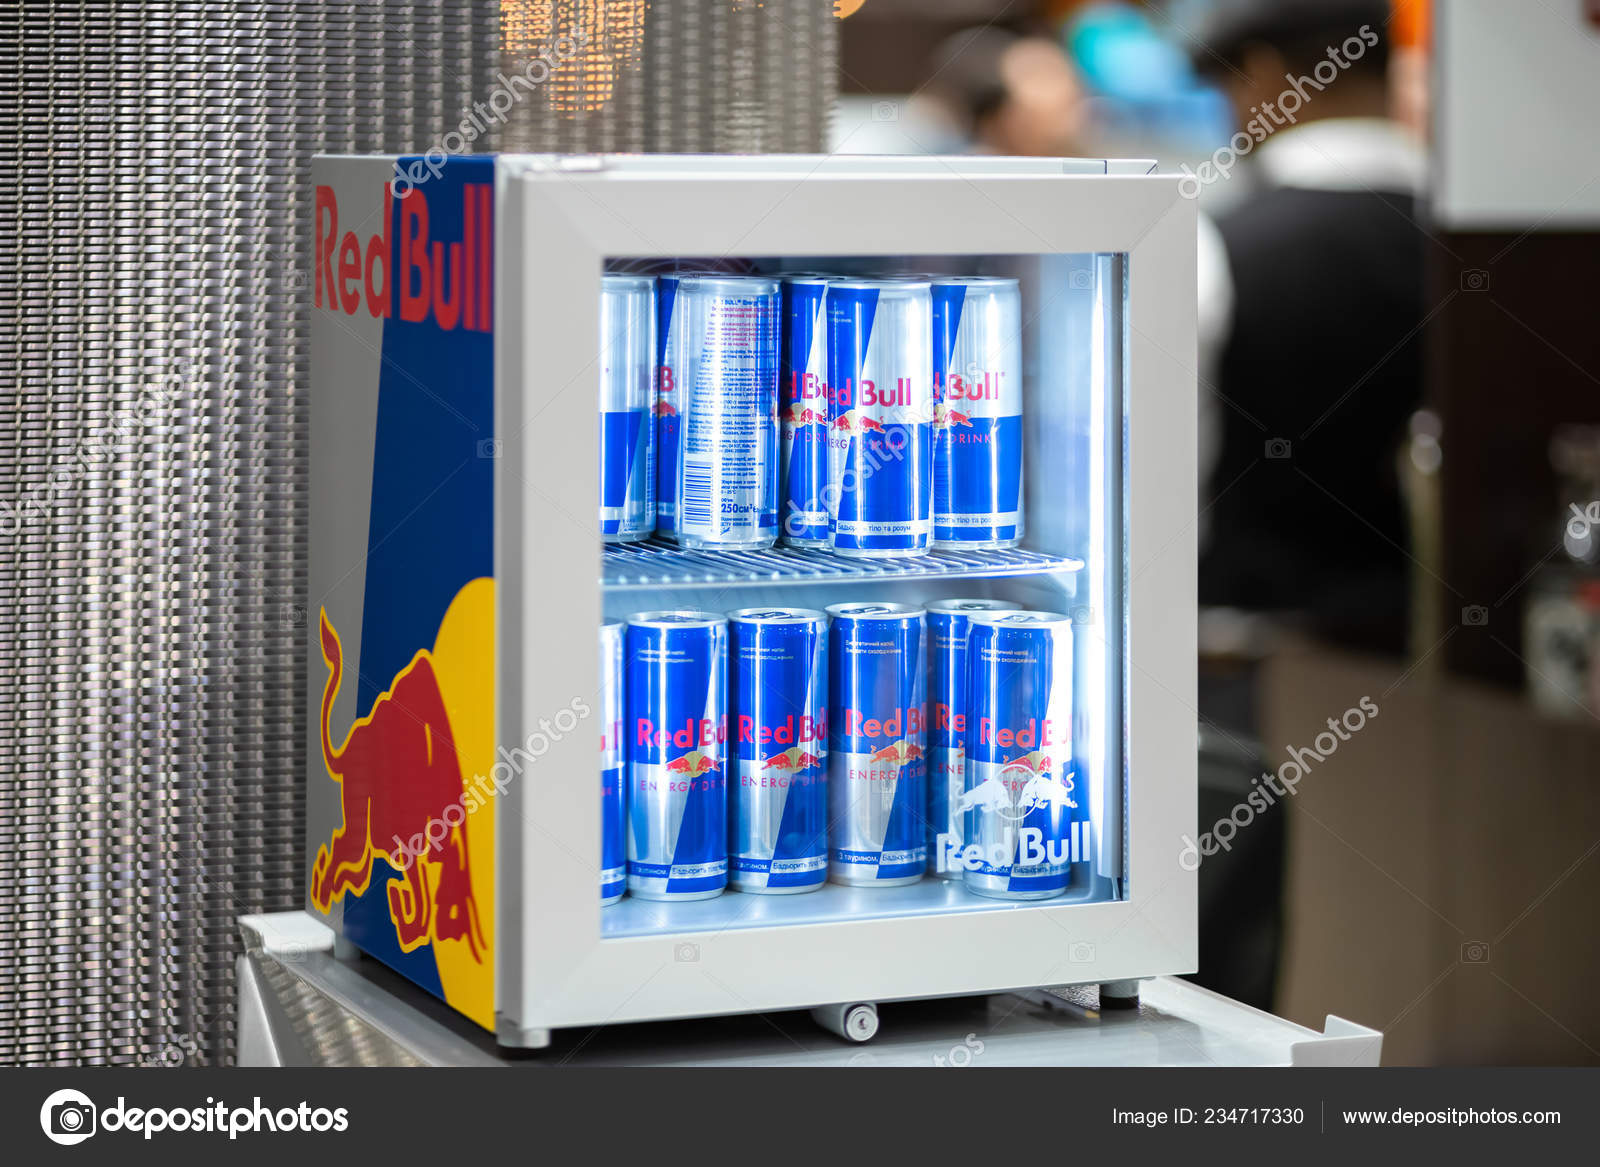 Red Bull Dosen Kühlschrank : Kiew ukraine september red bull marken kühlschrank mit einer